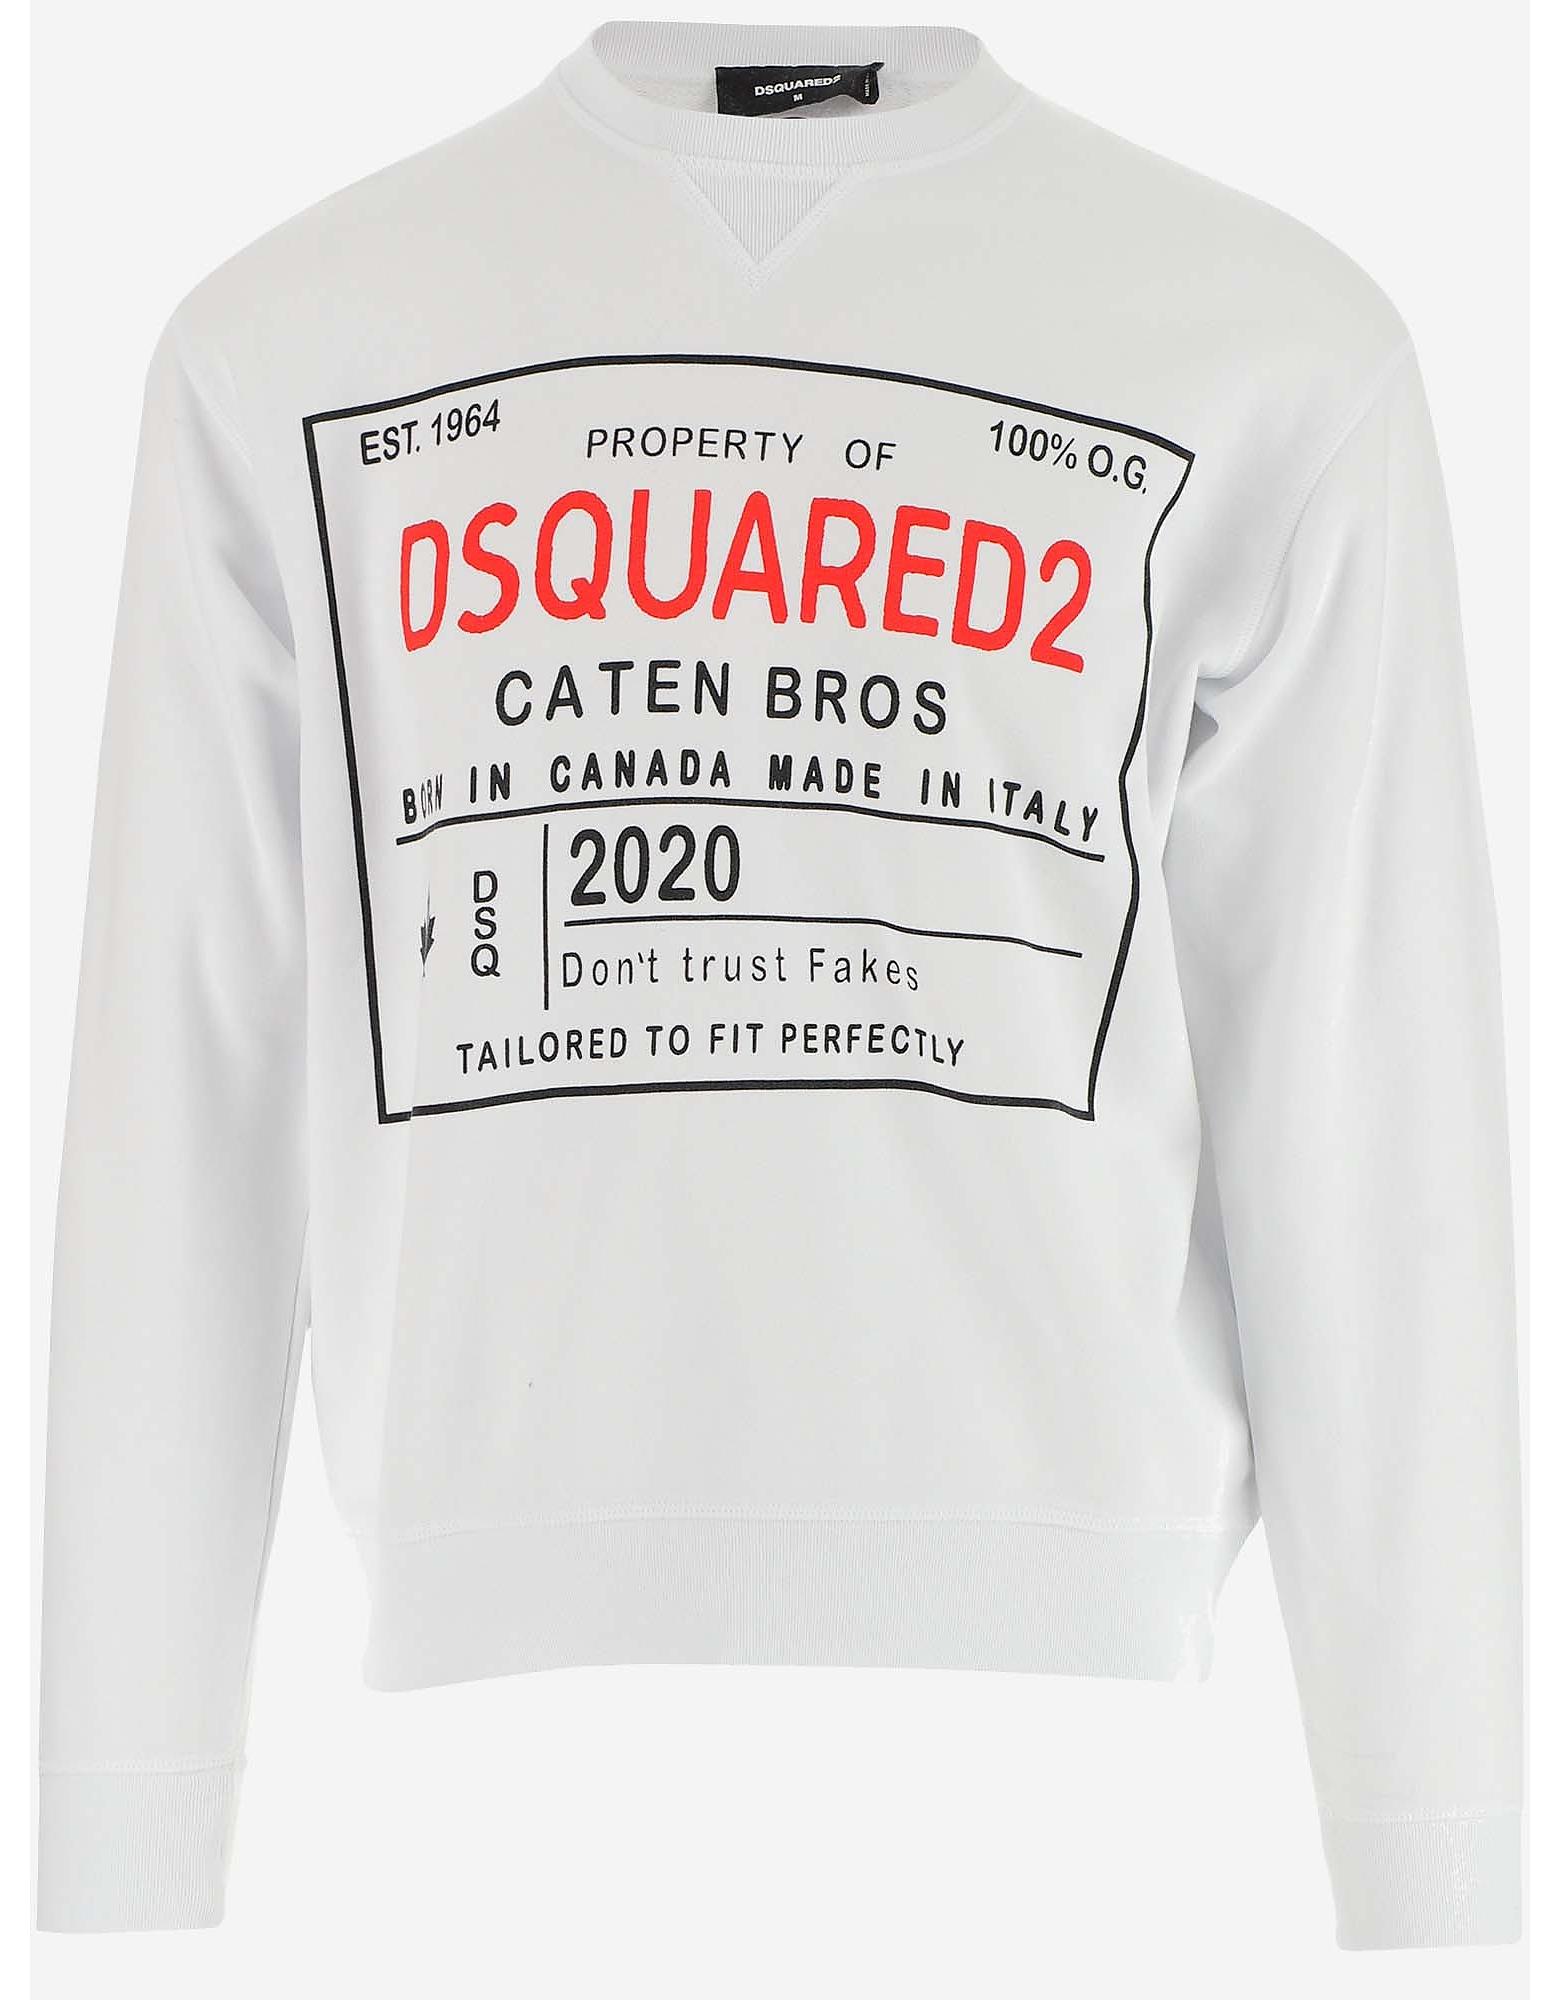 DSquared2 Designer Sweatshirts, White Cotton Signature Print Men's Sweatshirt